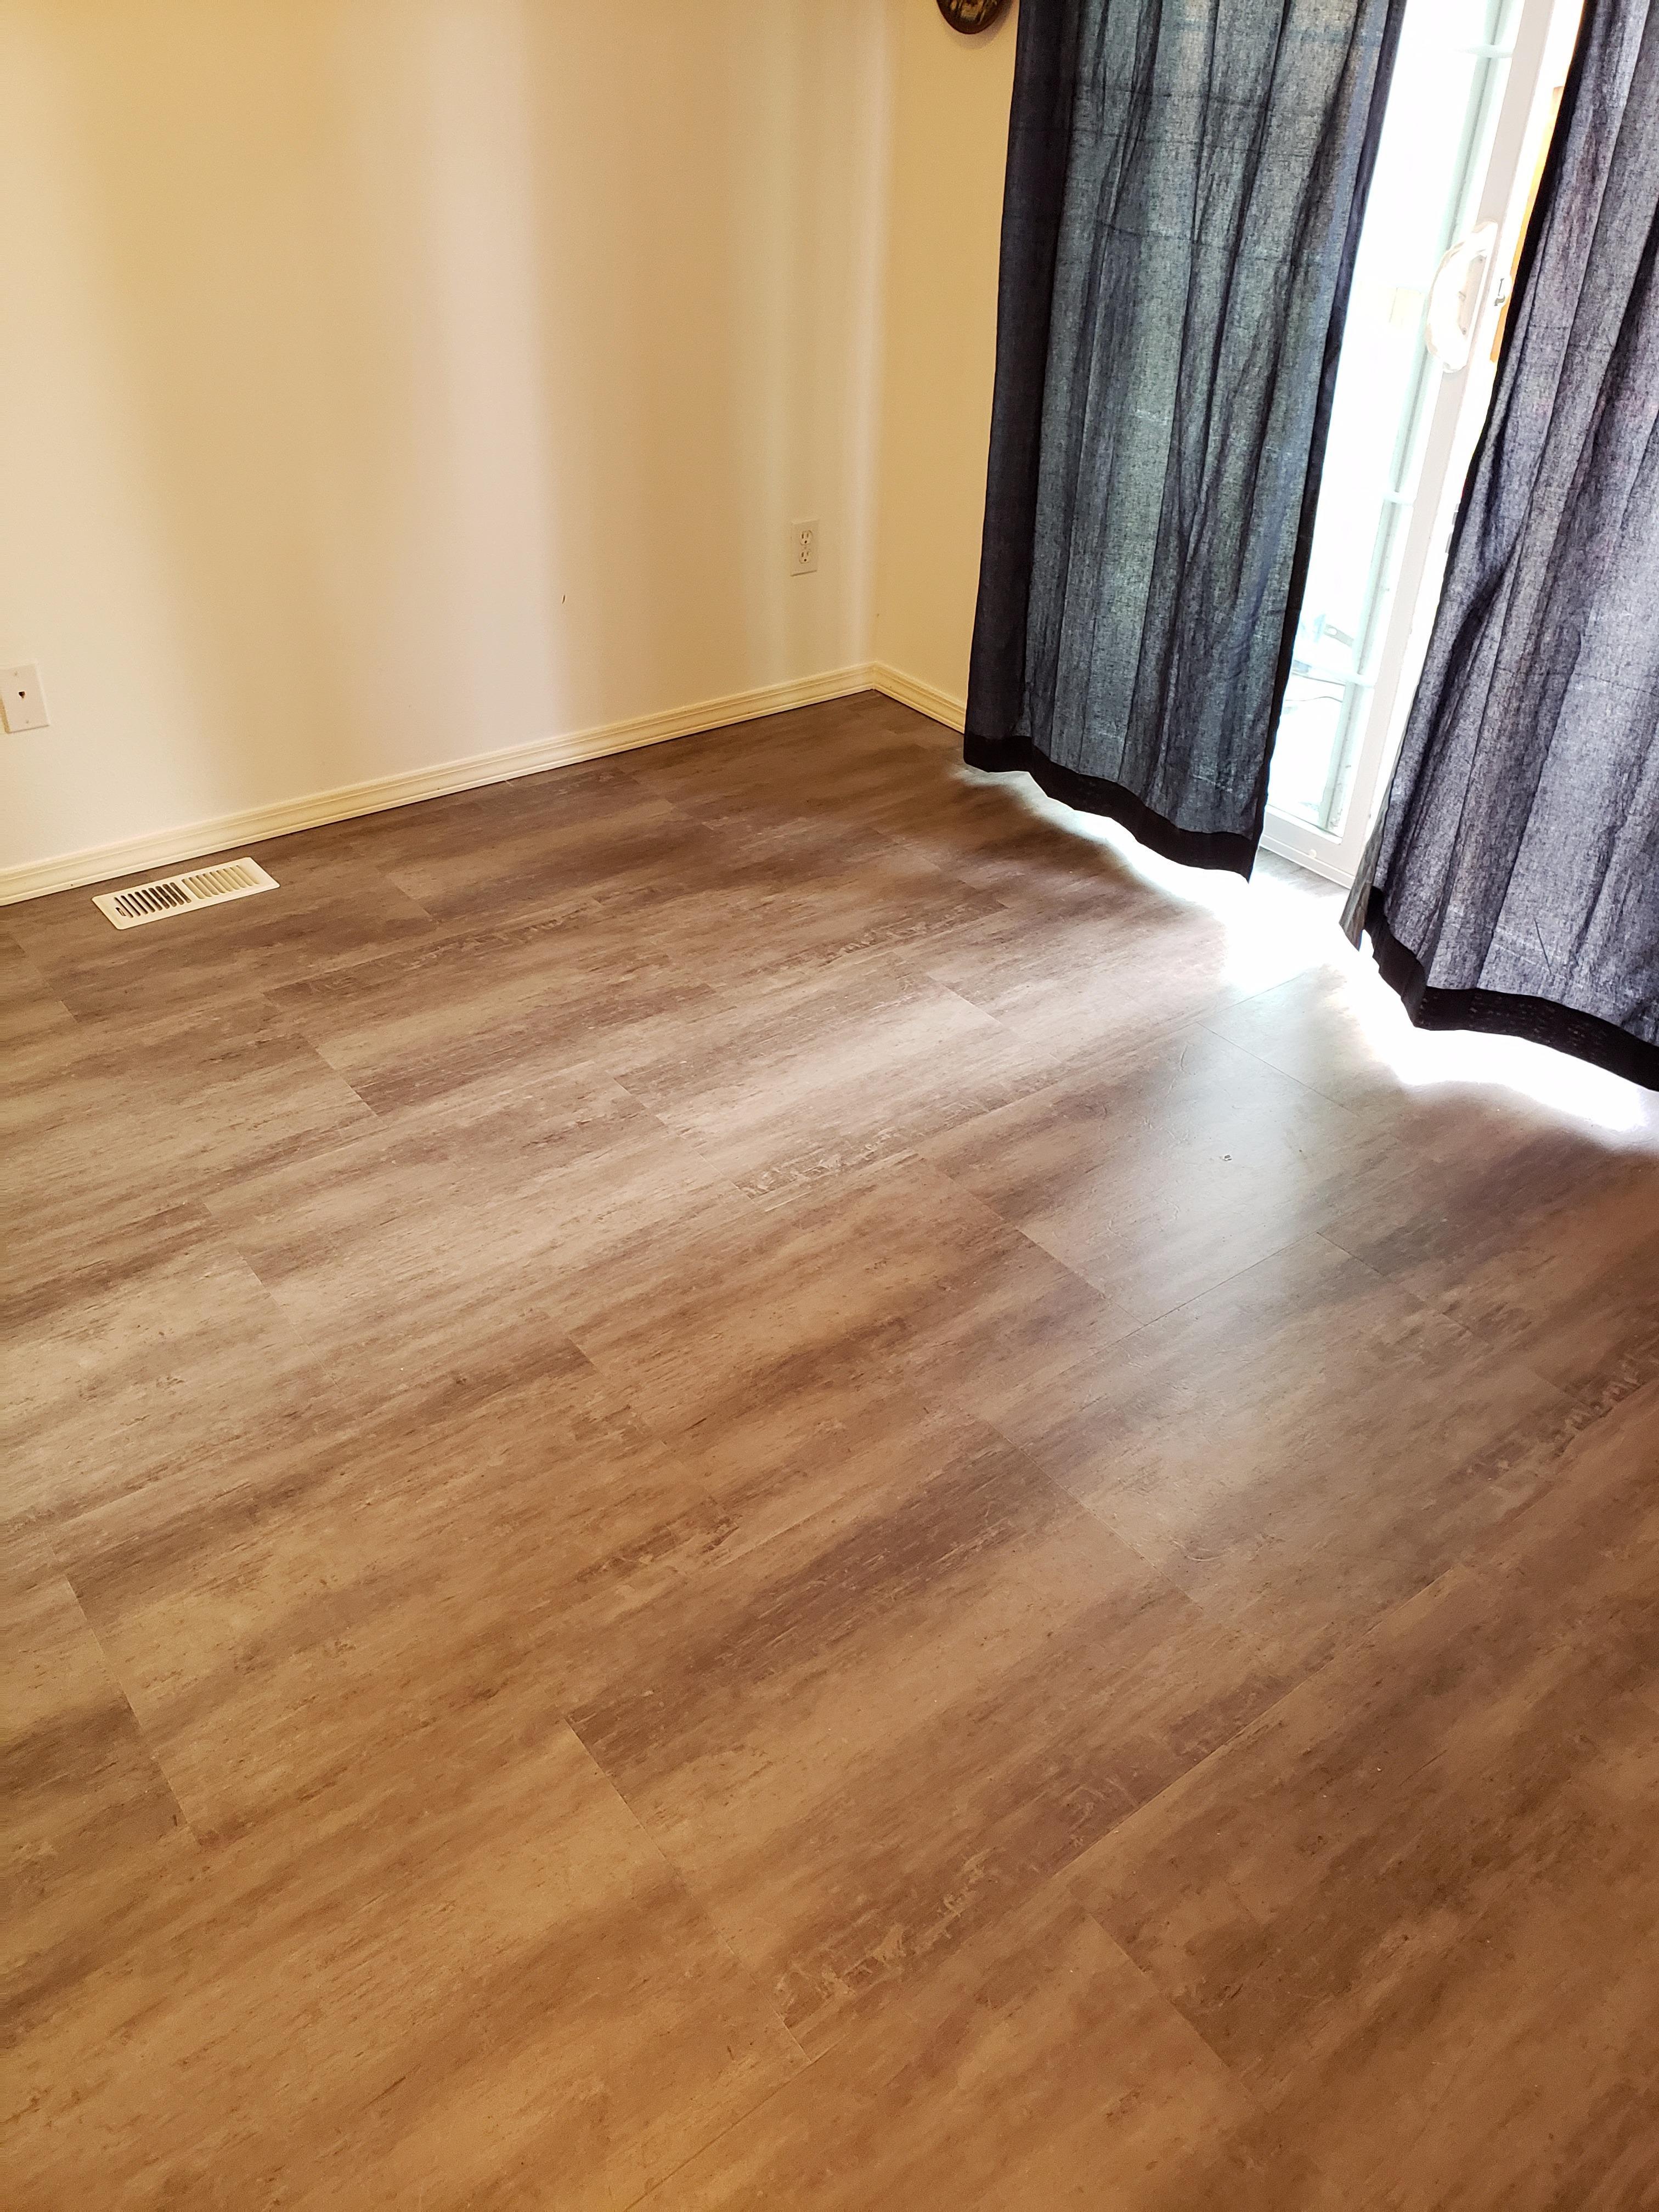 Florcraft Carpet One Floor & Home